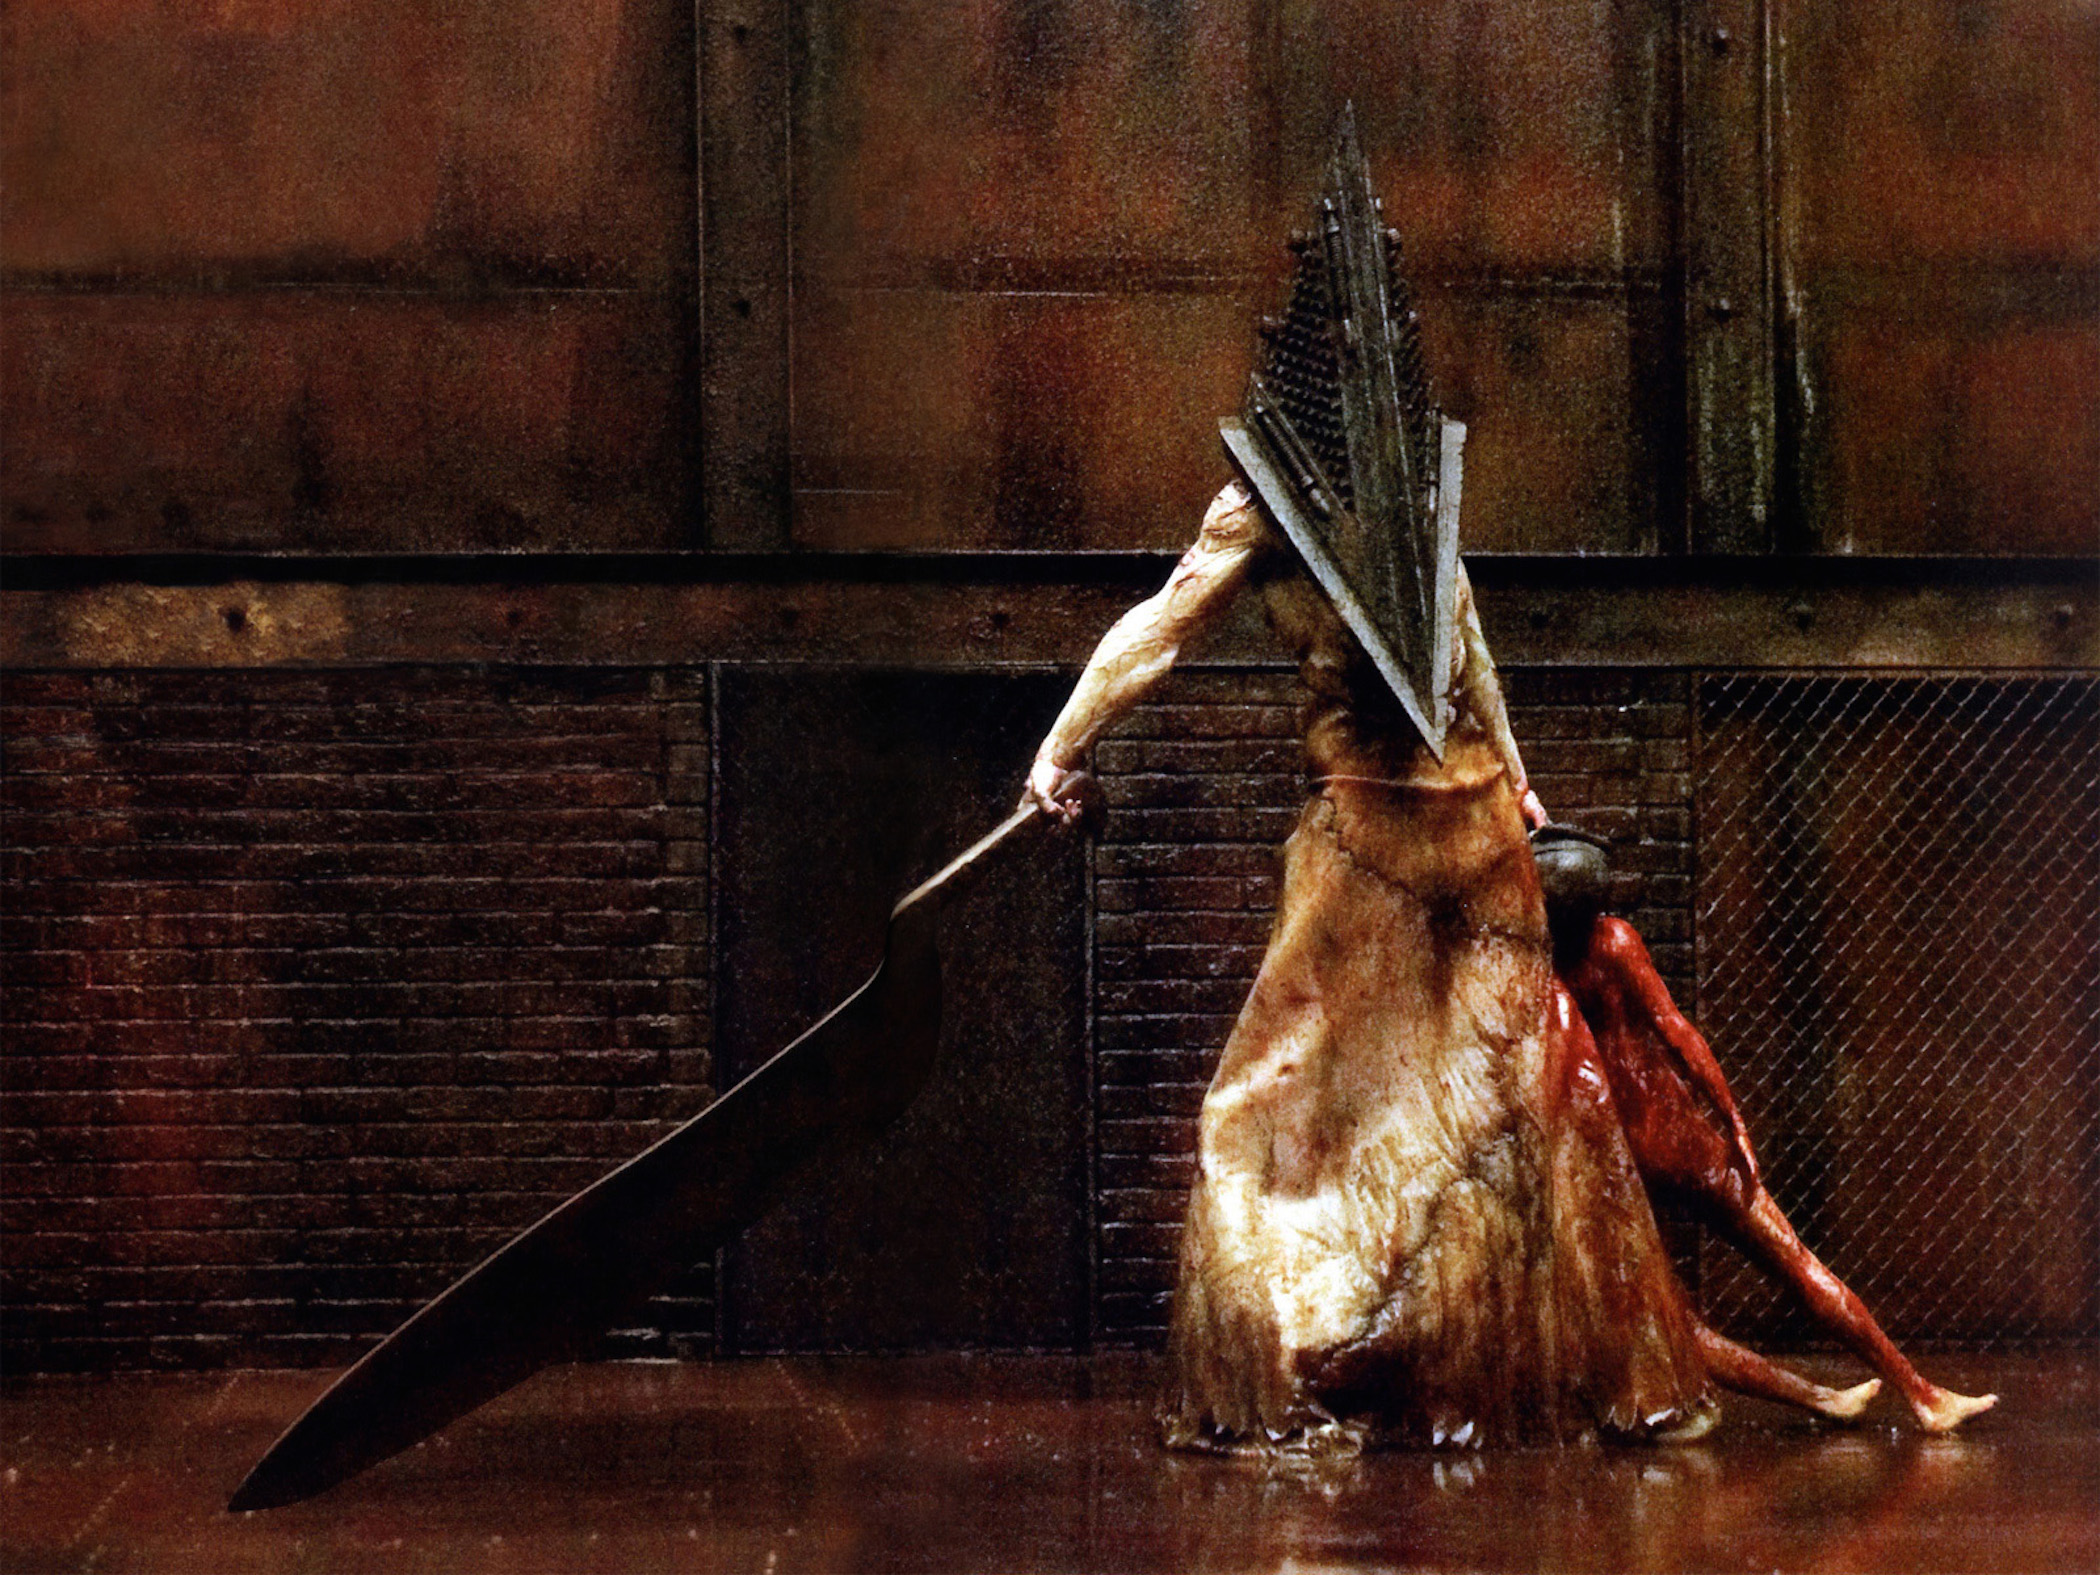 Silent Hill Pyramid Head Wallpaper Free Hd Downloads